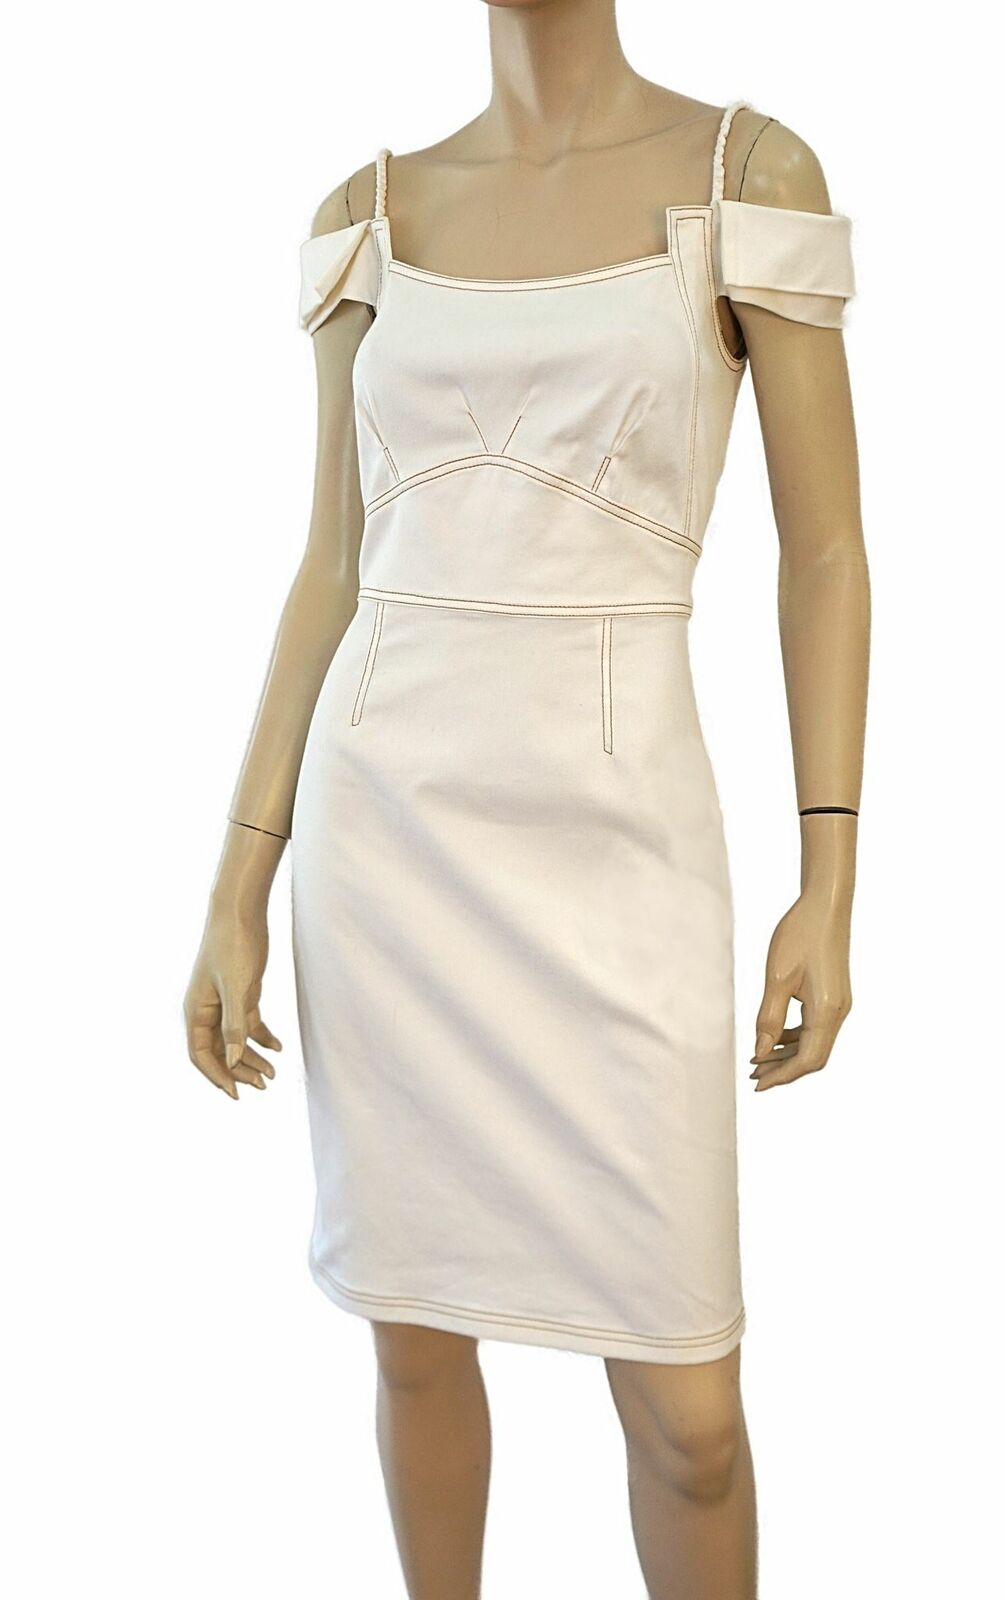 ZAC POSEN blancoo  Stretch Denim Vestido Tubo del hombro 6  muy popular